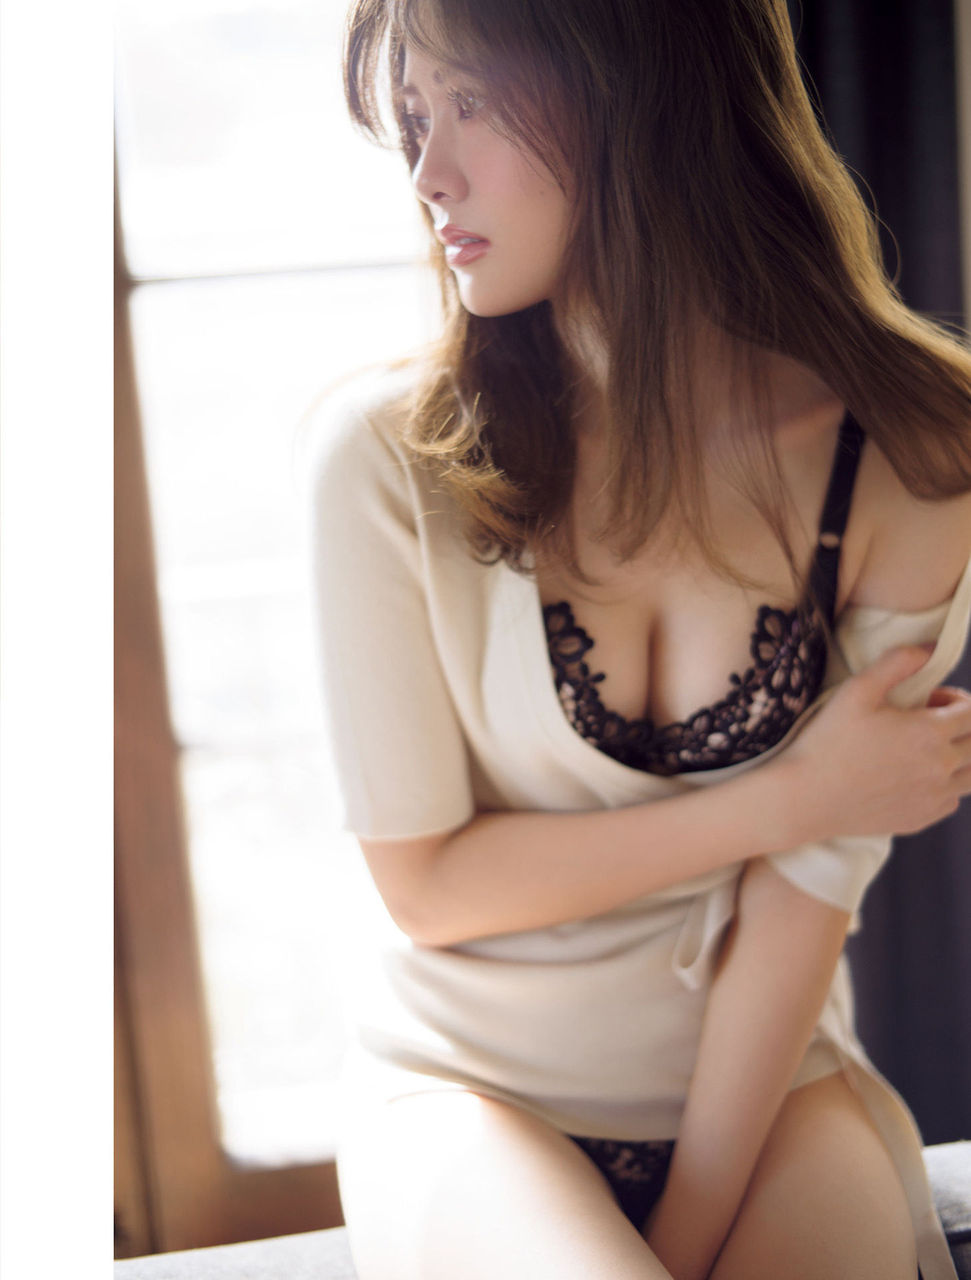 白石麻衣エロ画像tumblr_owzytj3s2C1w3ota5o8_1280